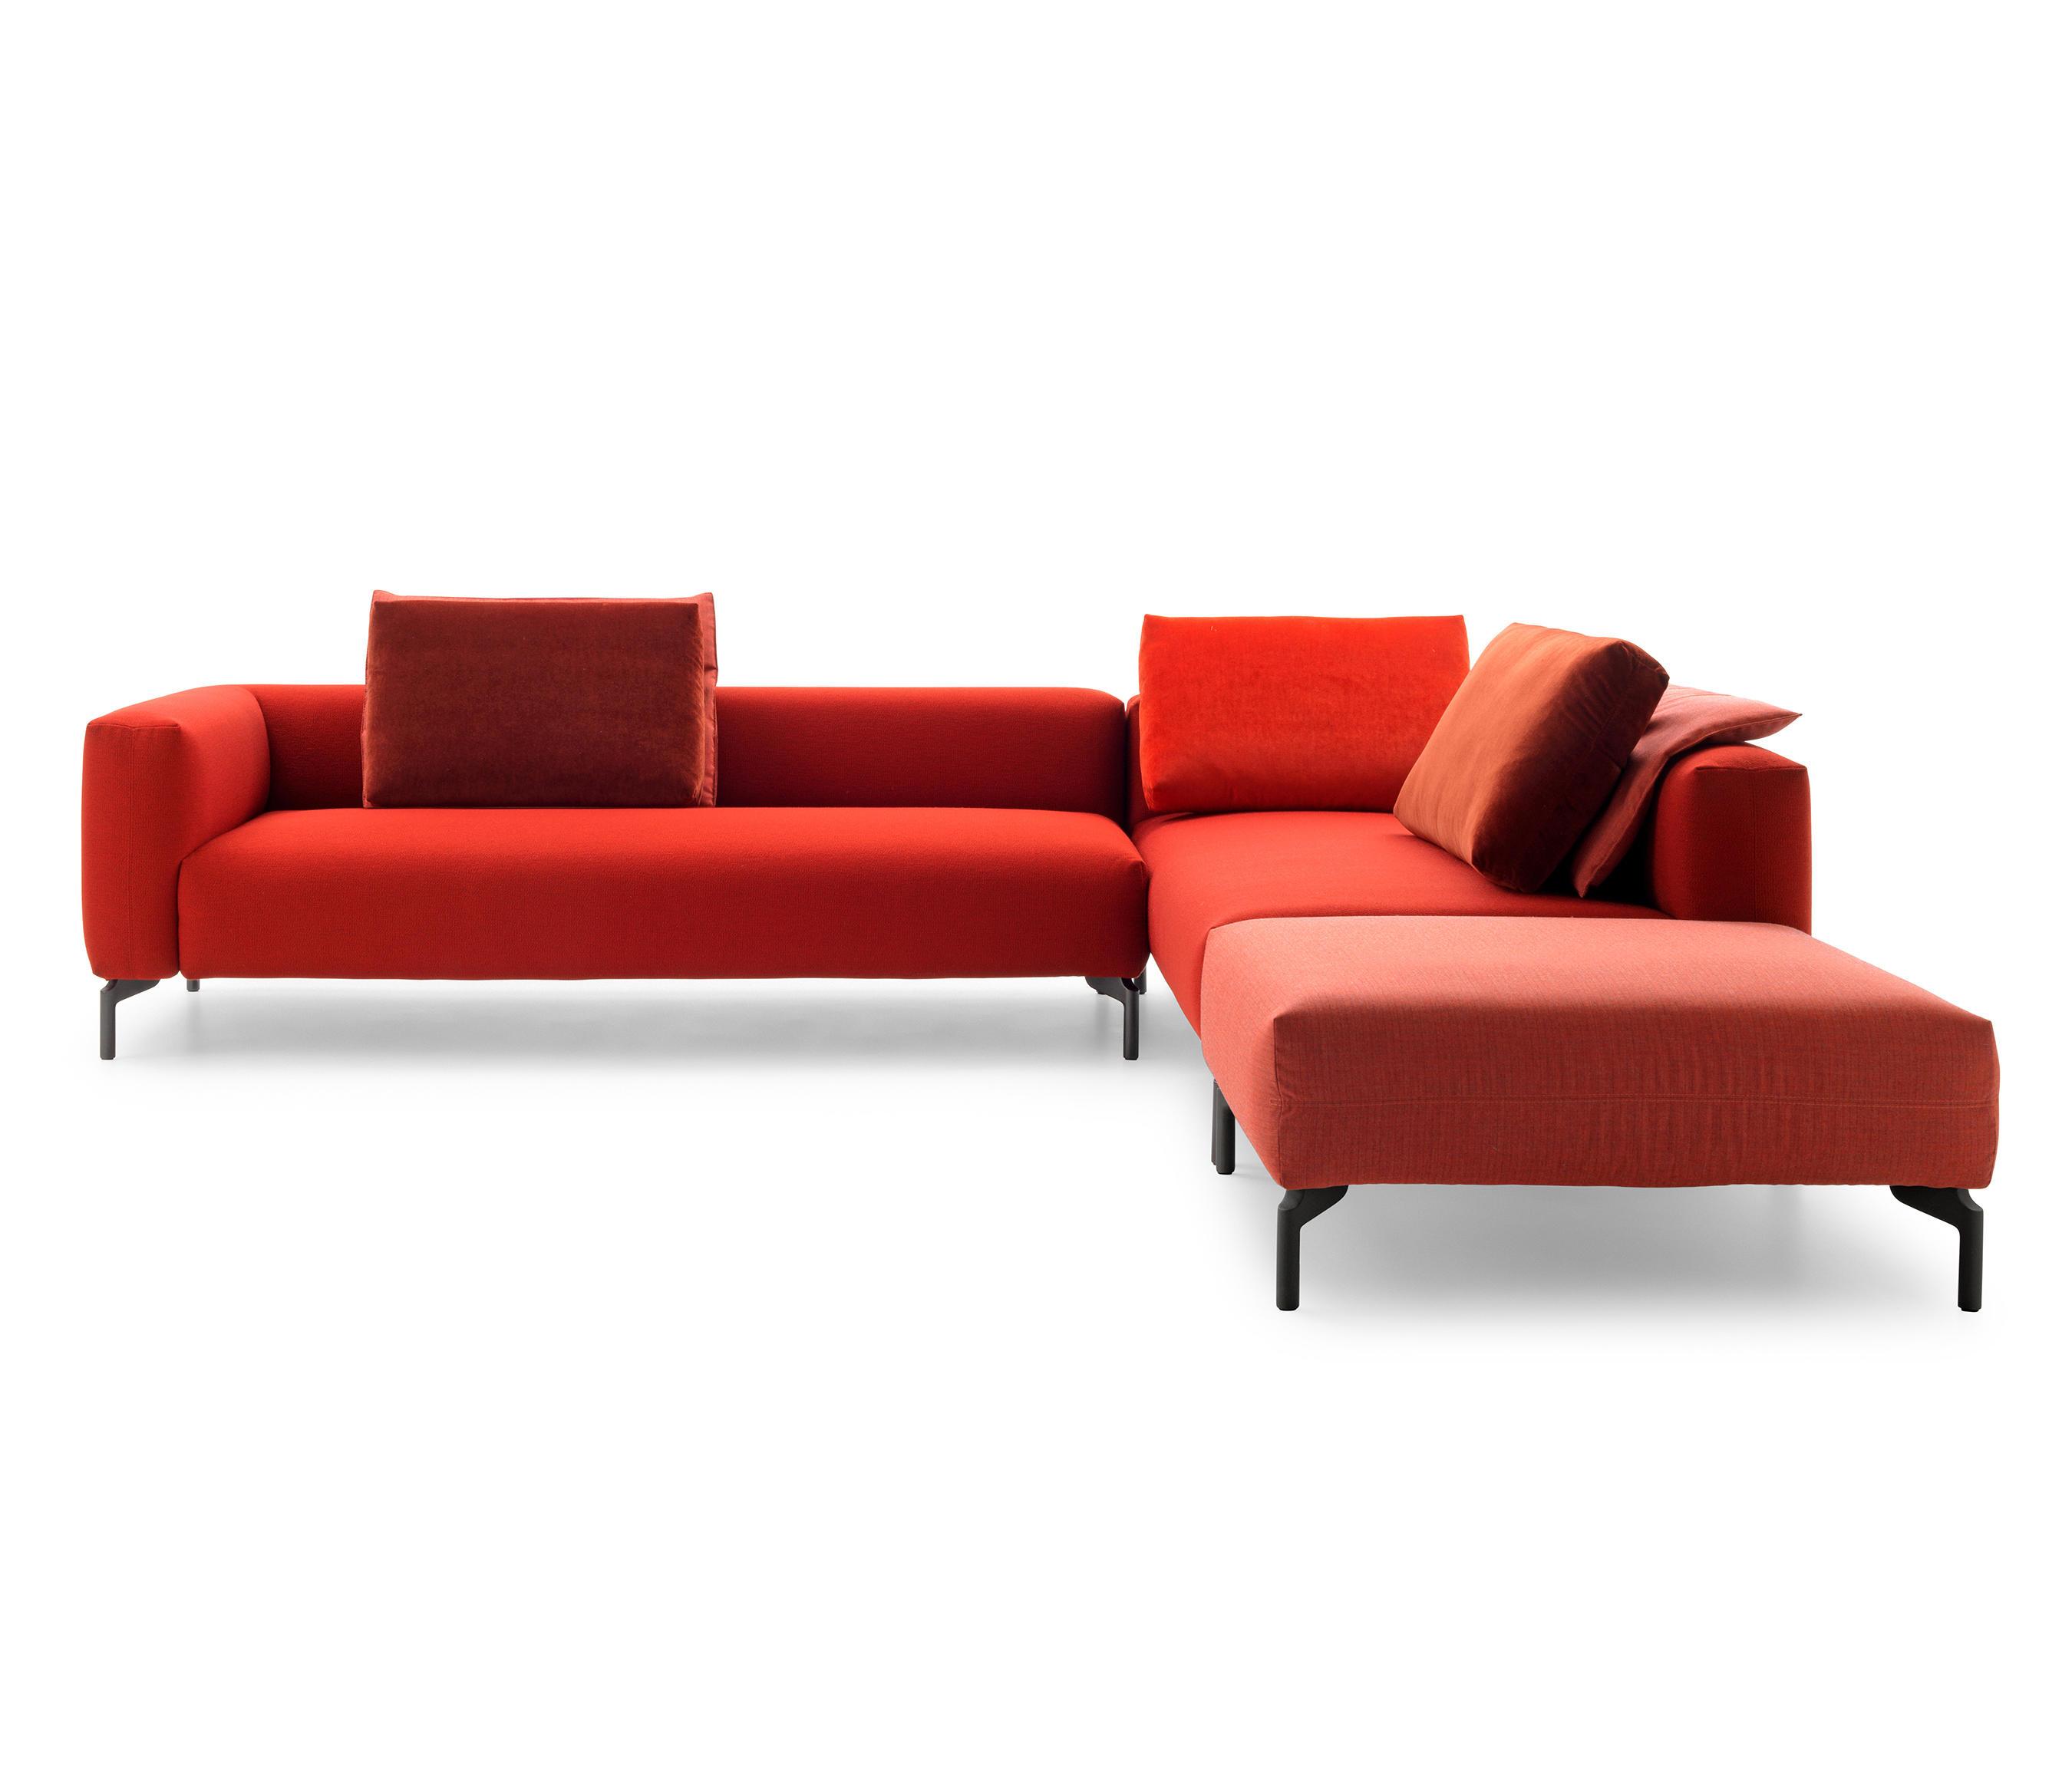 LX698 Modular Sofa by Pascal Bosetti for Leolux LX